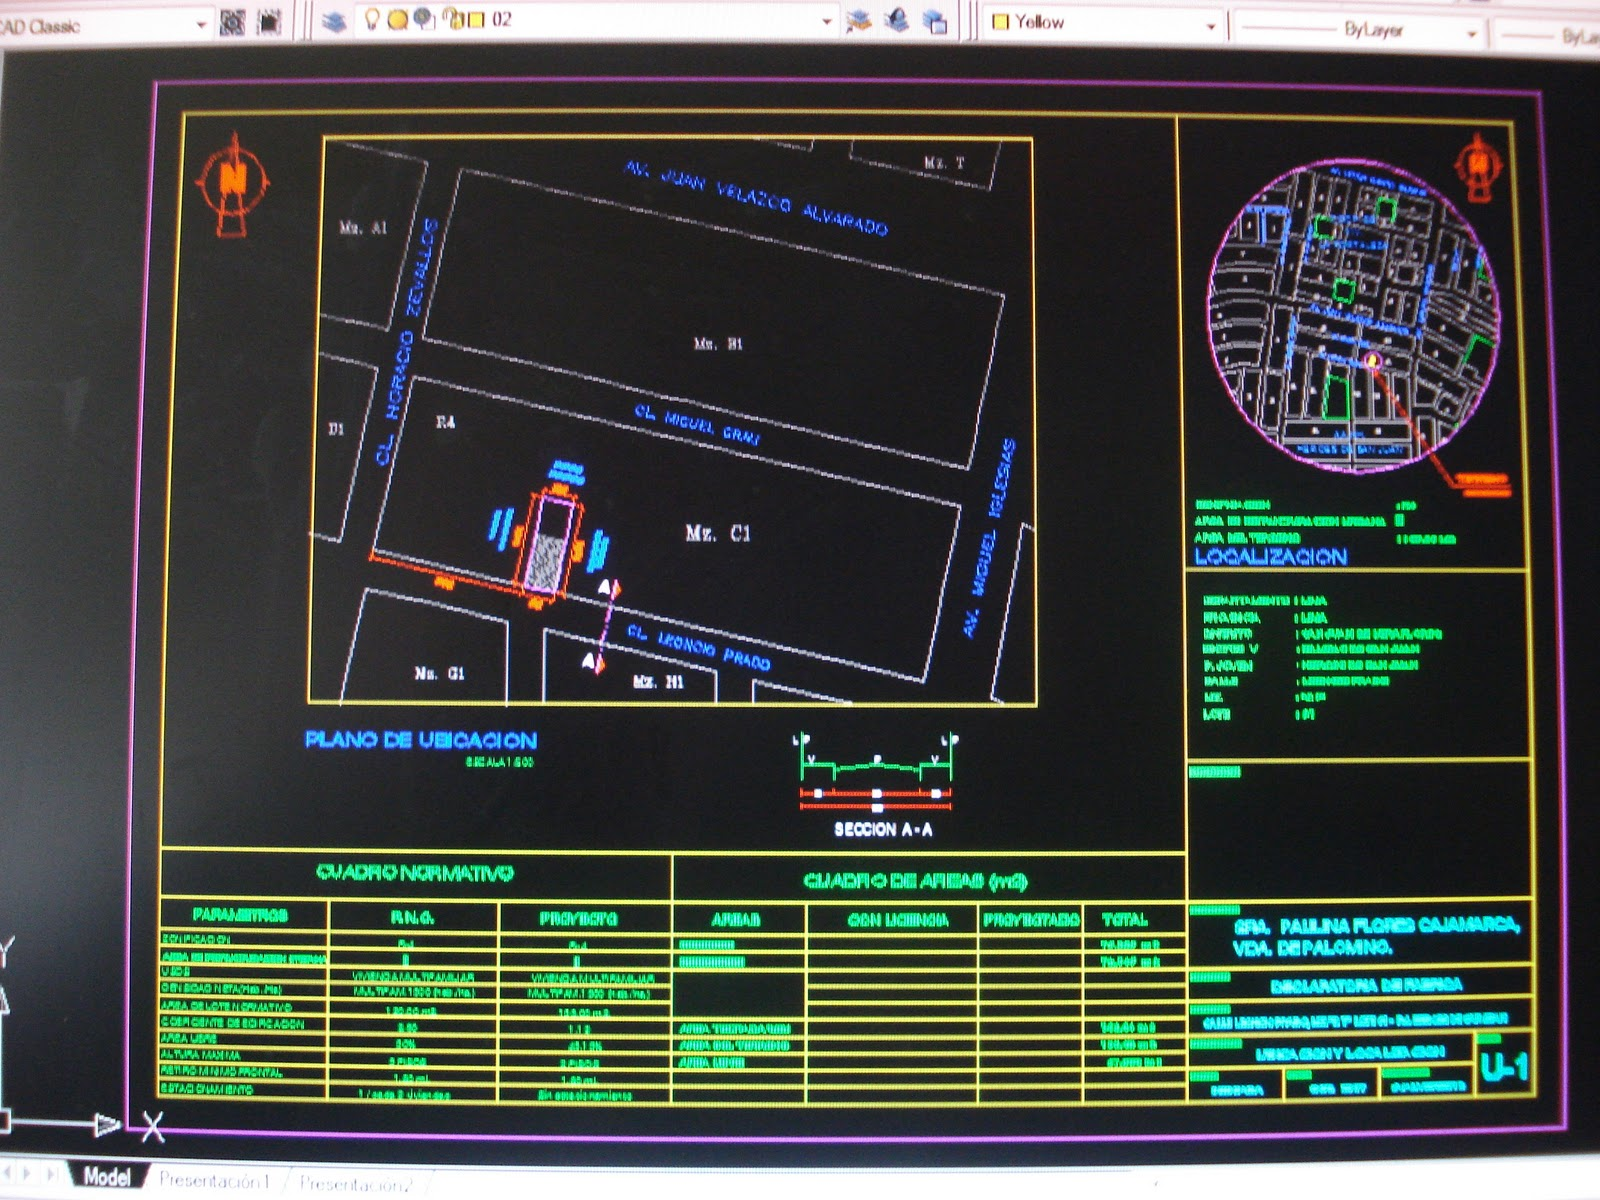 Arquitectura proyectos 3d planos de arquitectura e for Planos de arquitectura